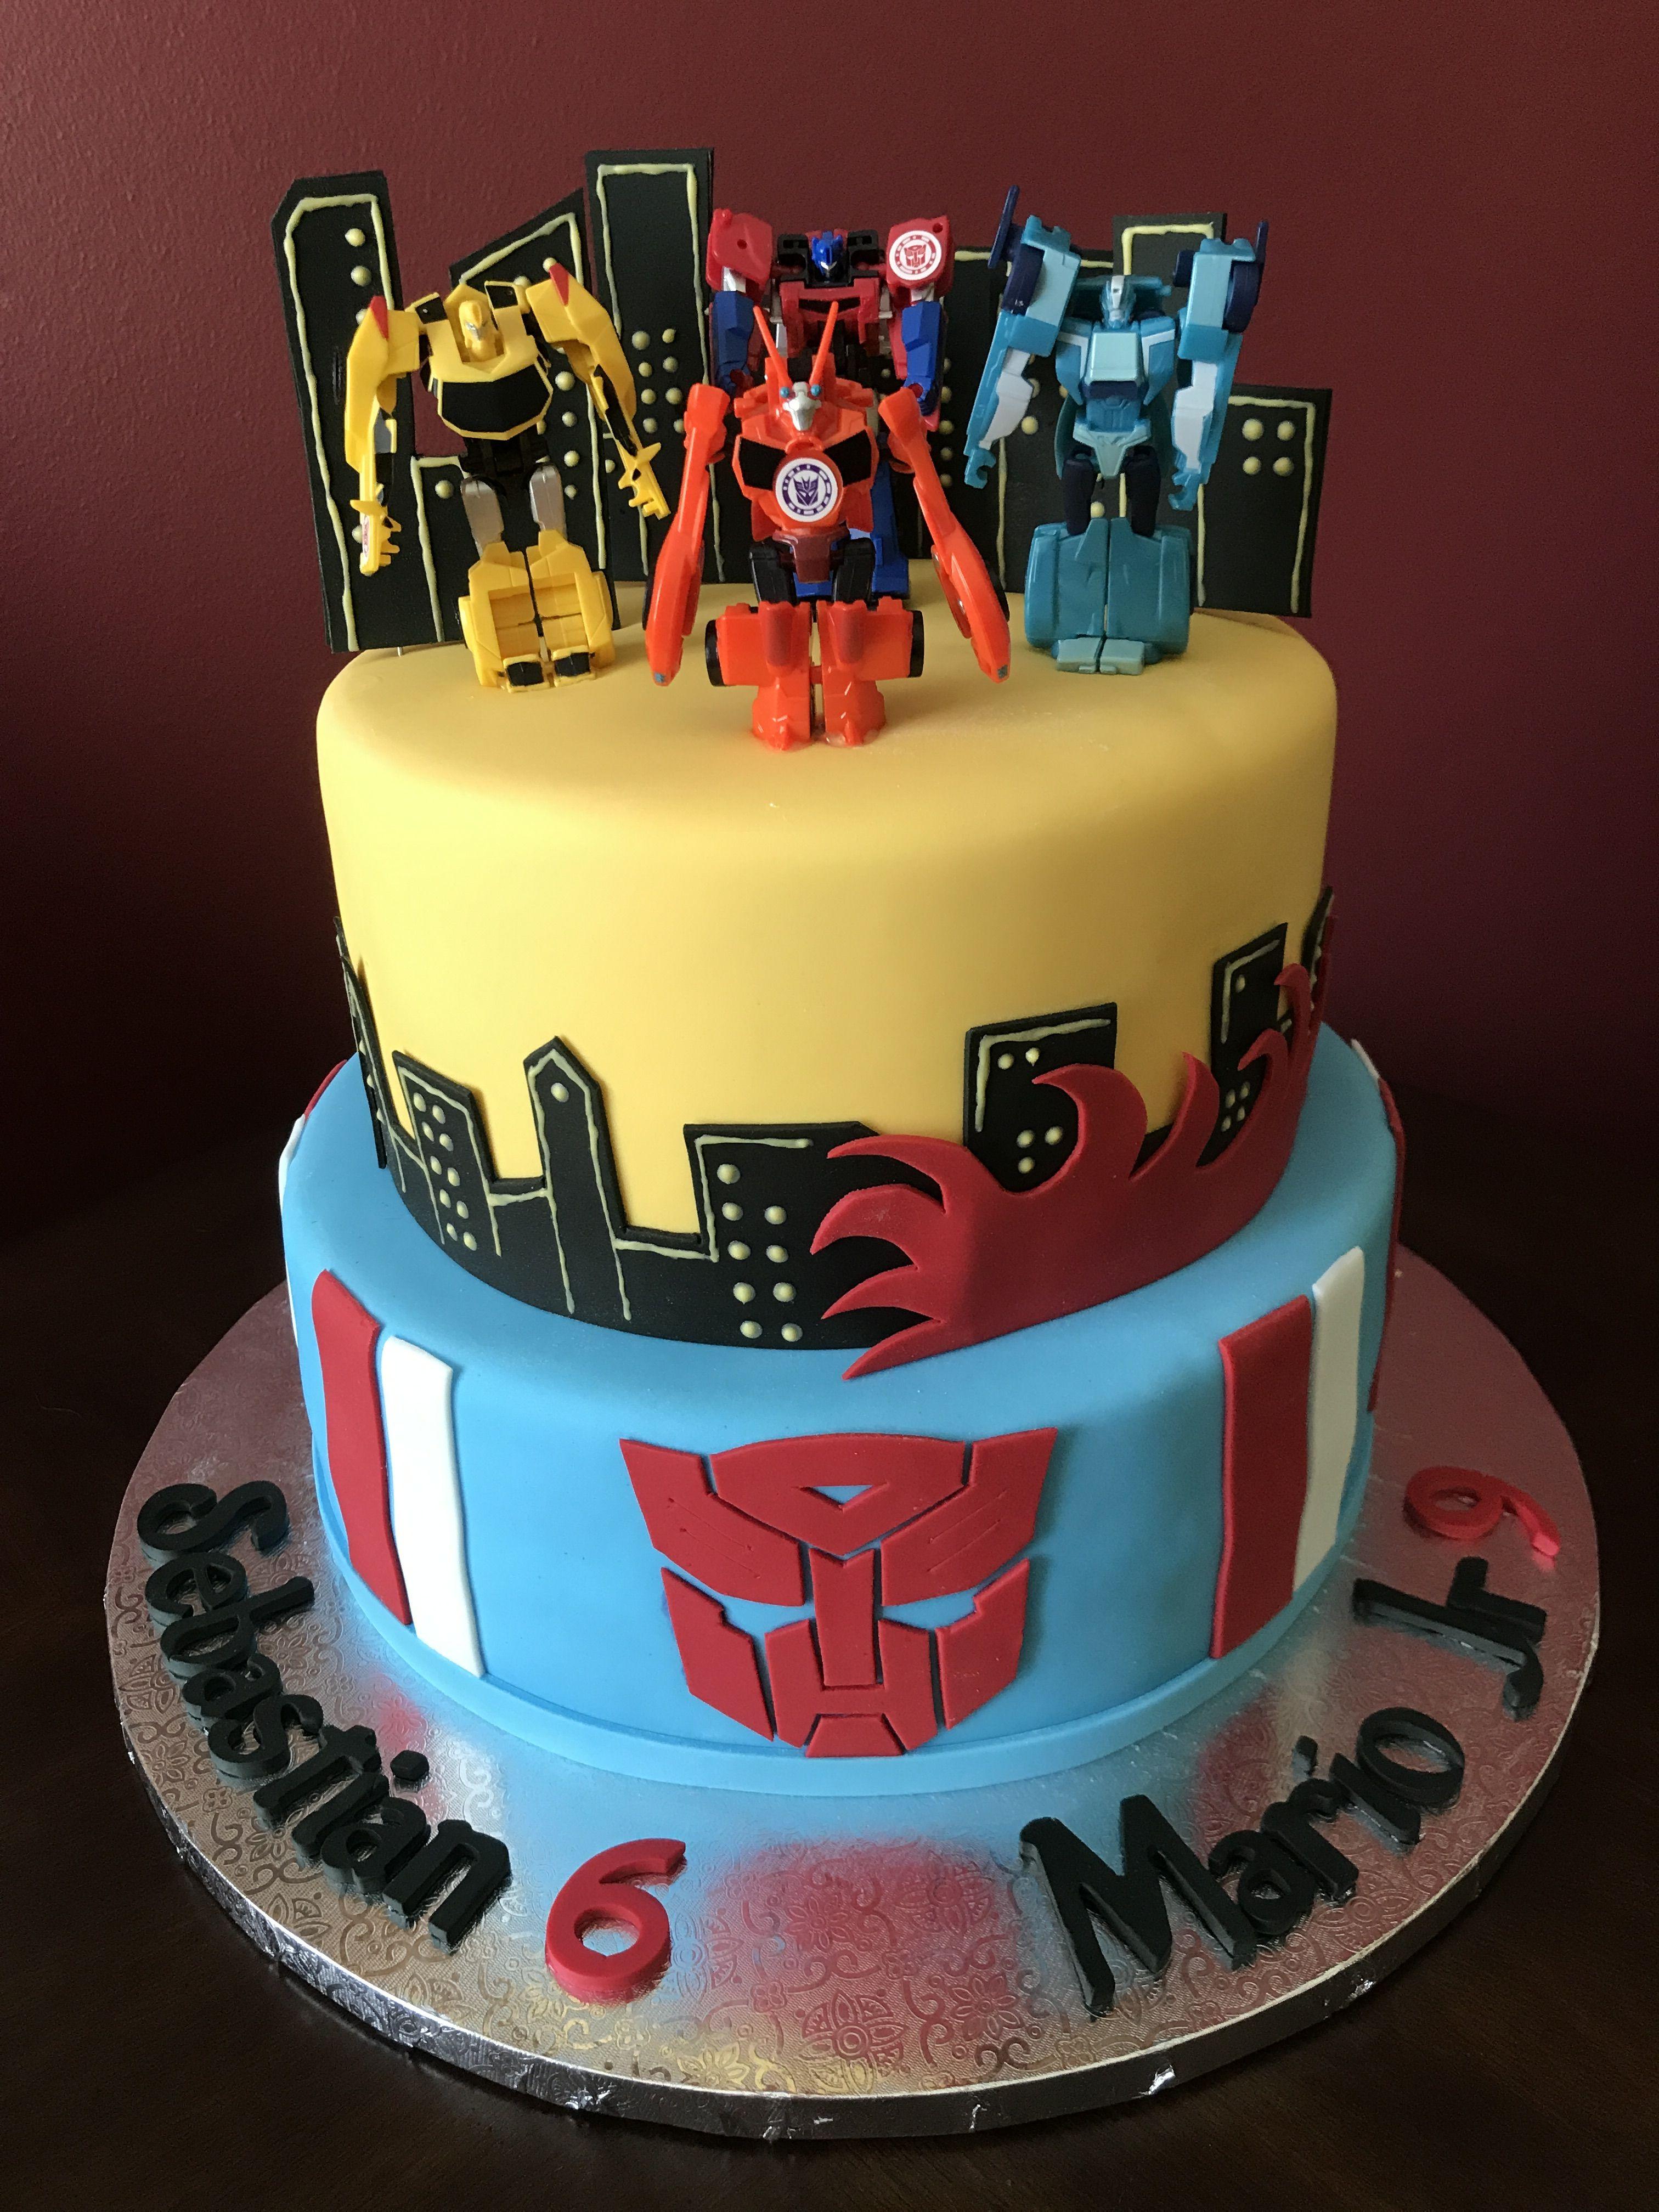 Stupendous Transformers Birthday Cake Transformers Birthday Cake Funny Birthday Cards Online Ioscodamsfinfo